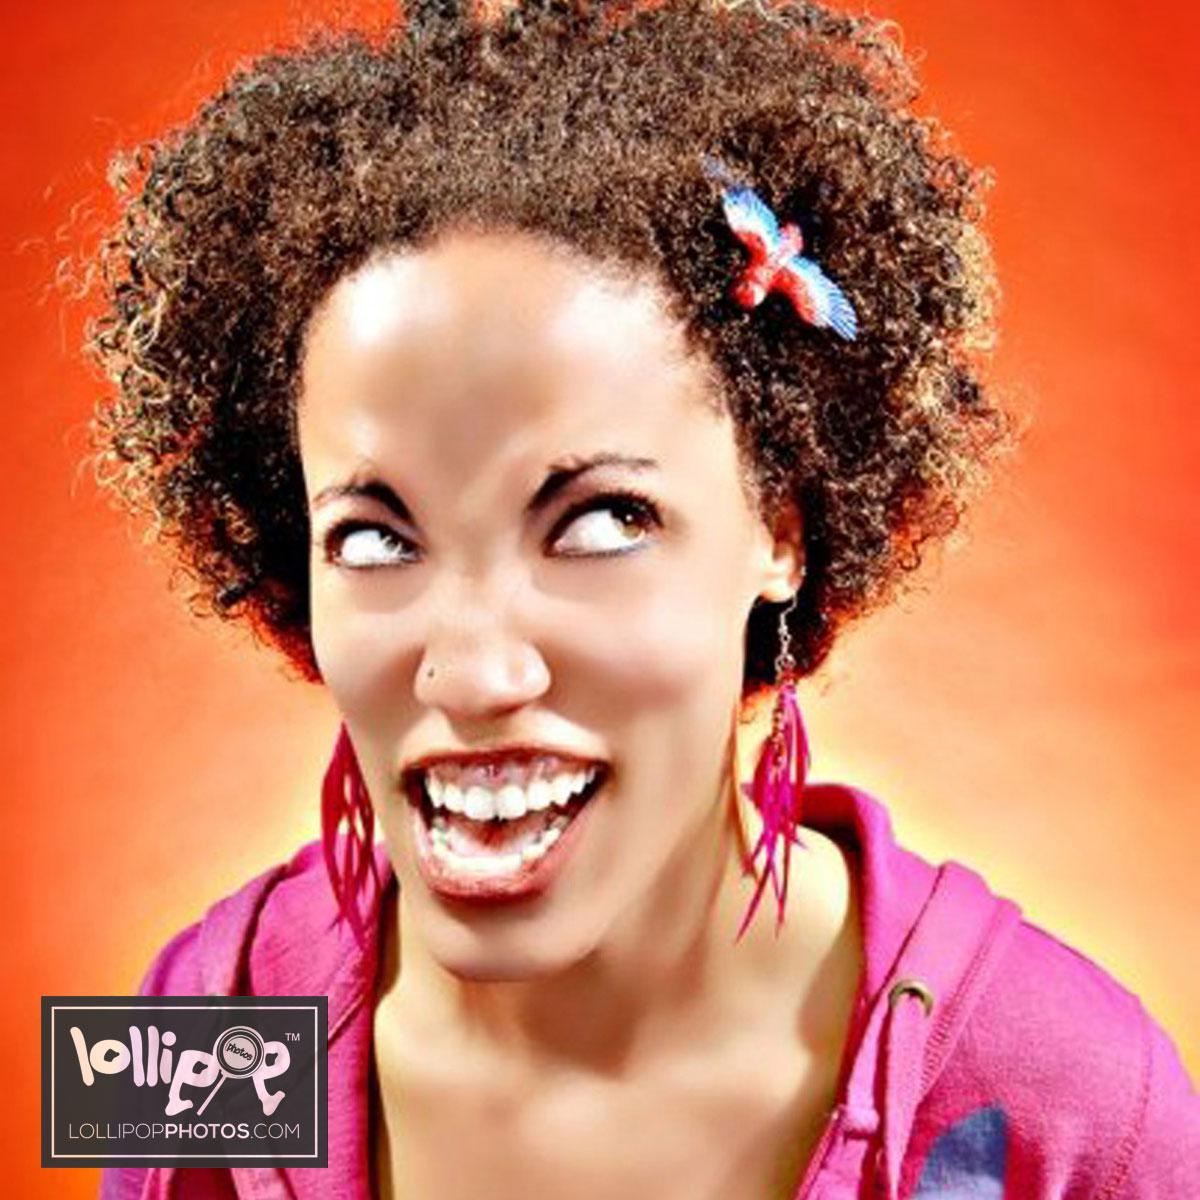 msdig-nora-canfield-lollipop-photos-112.jpg